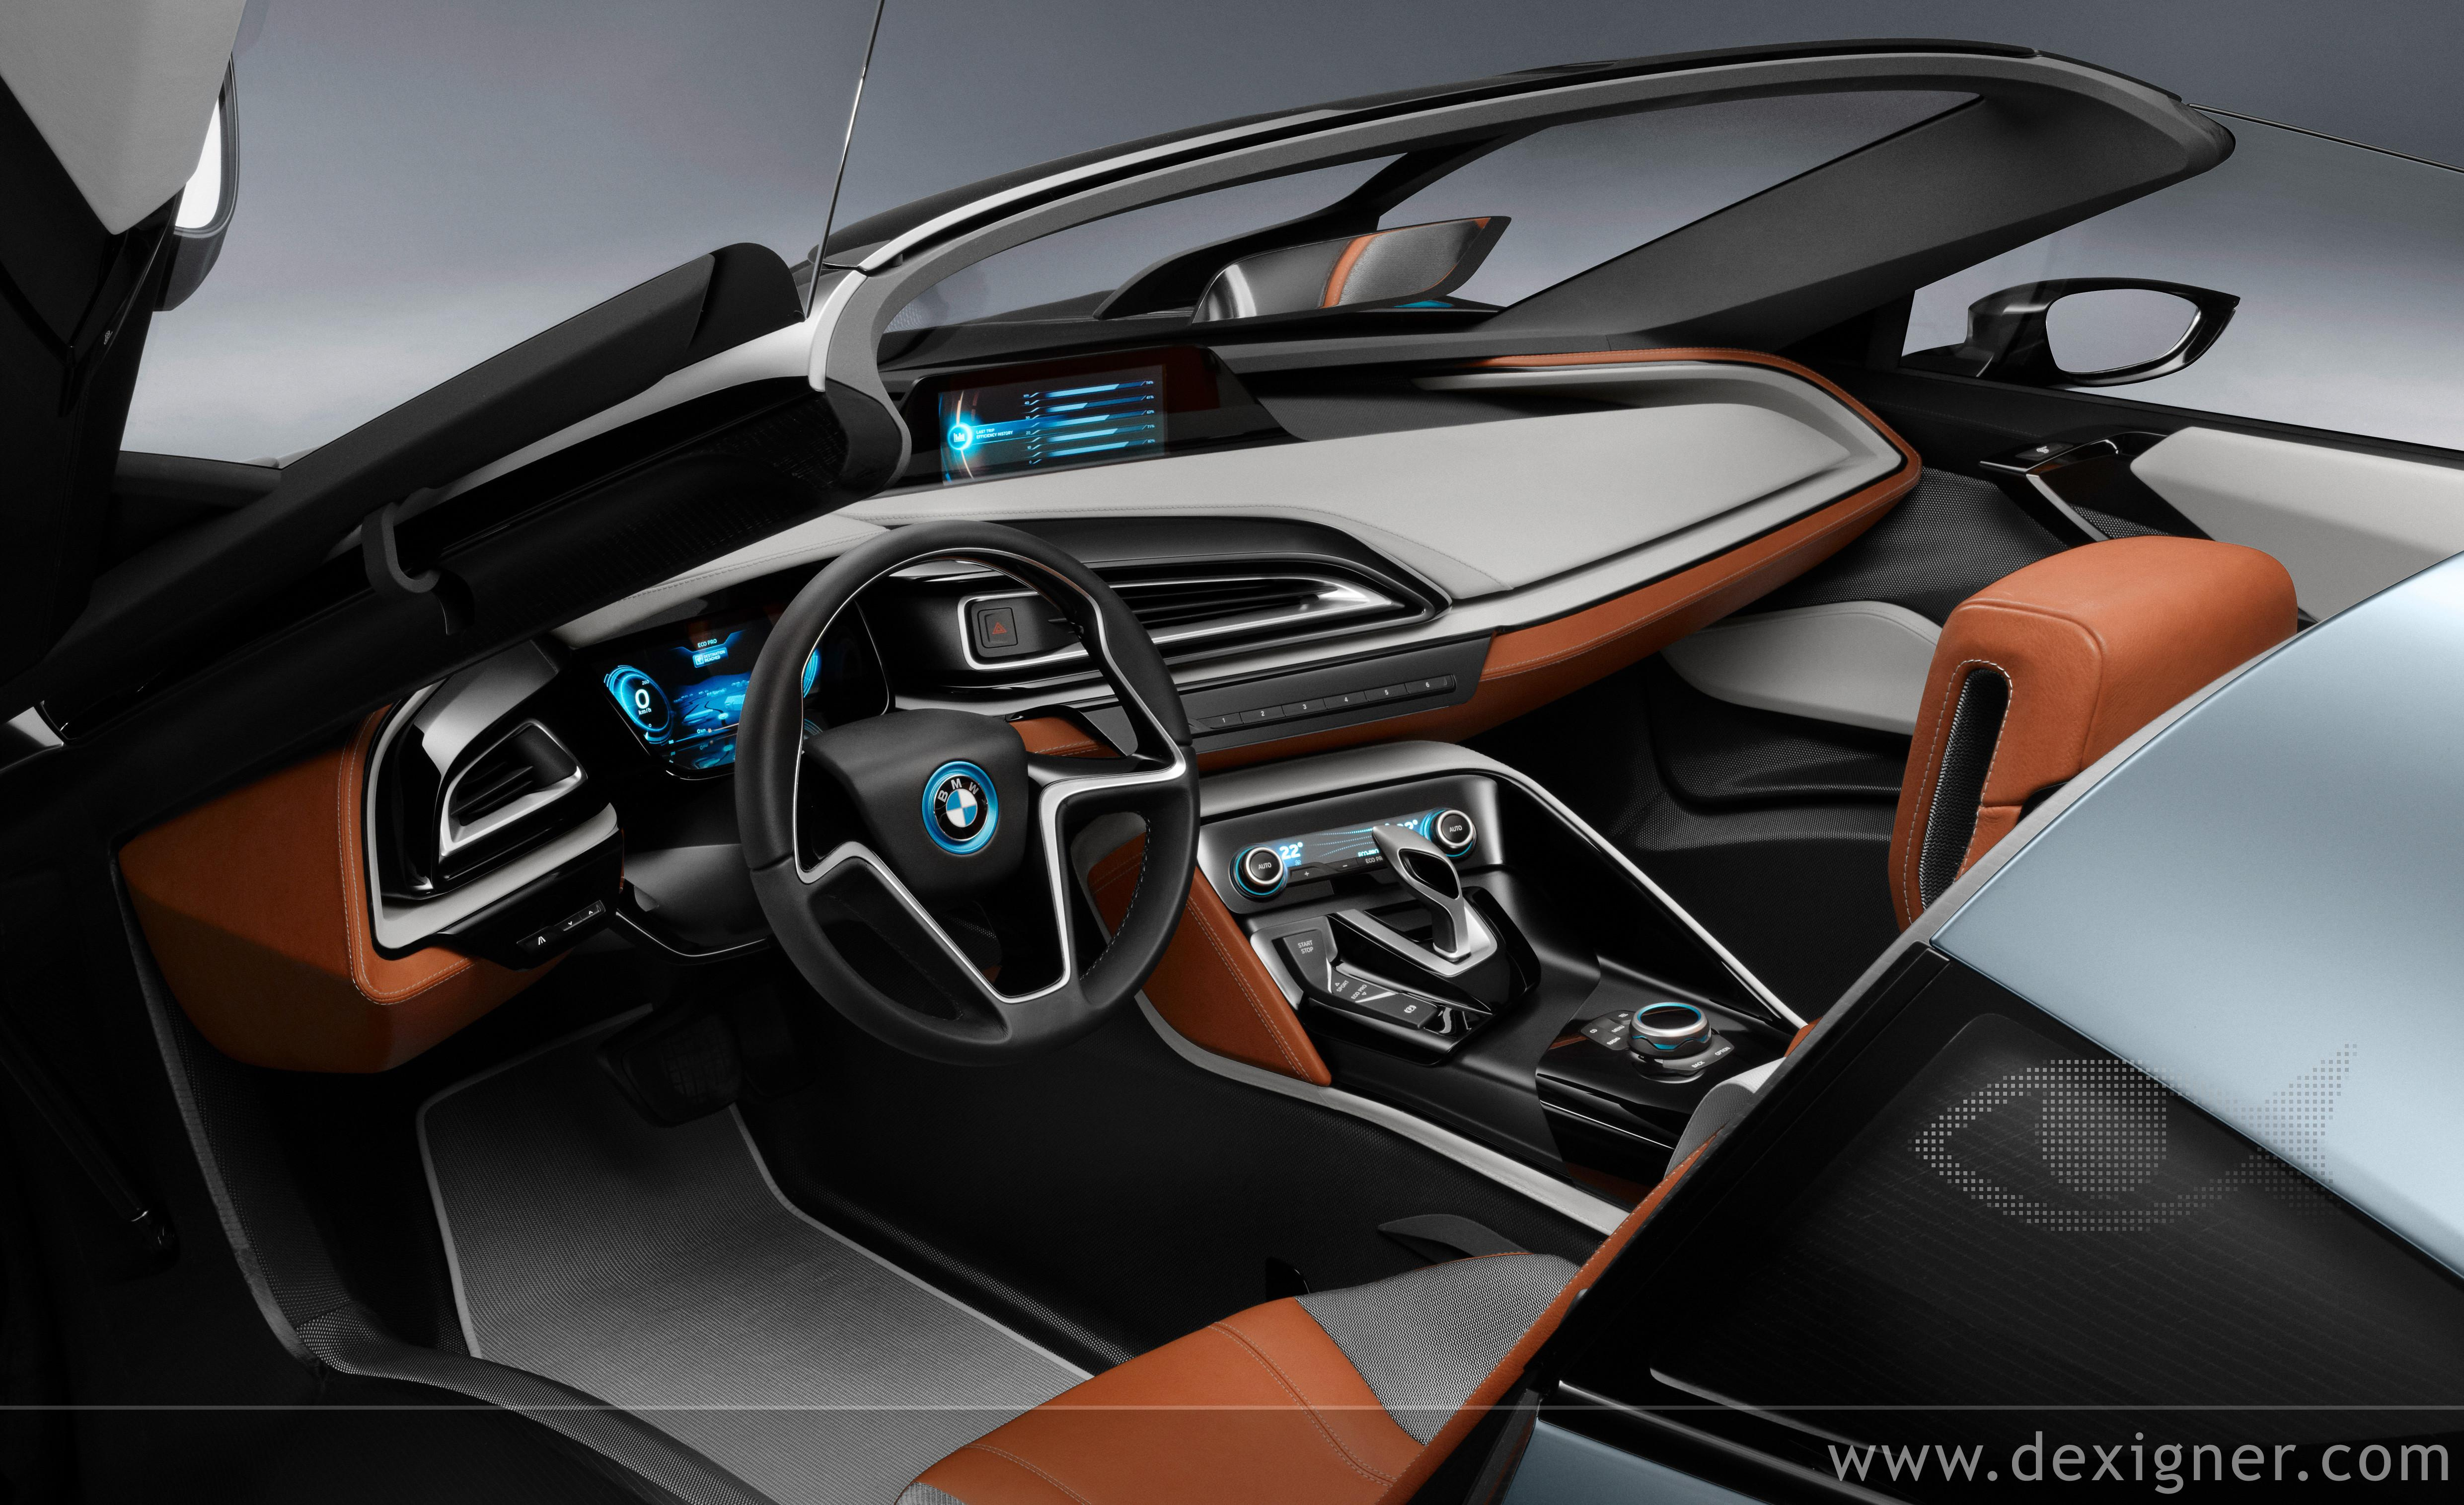 BMW_i8_Concept_Spyder_19.jpg (4961×3030)